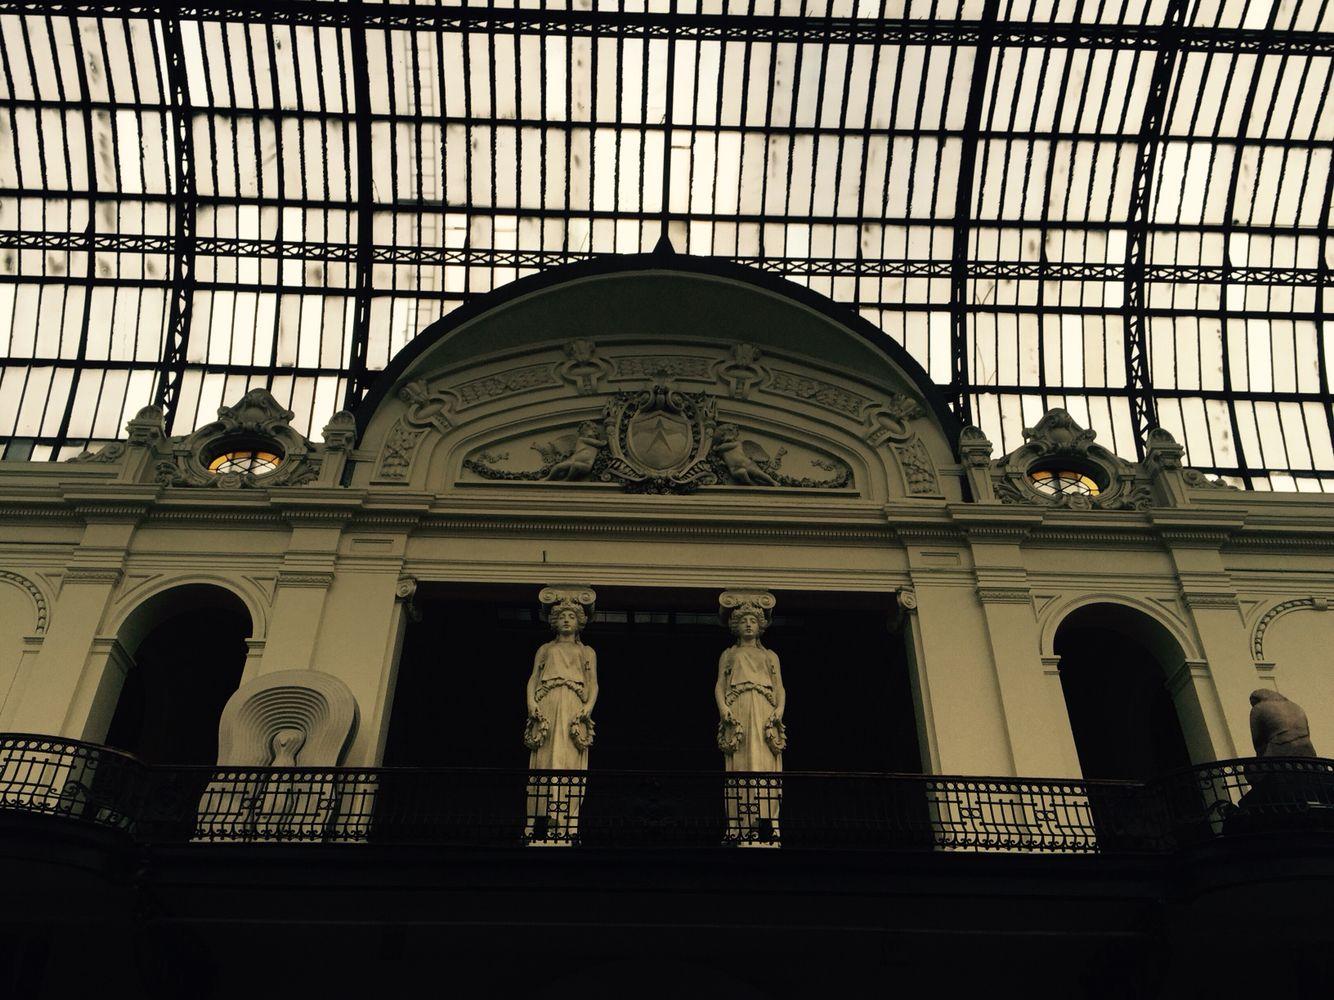 Museu Belas Artes - Santiago, Chile